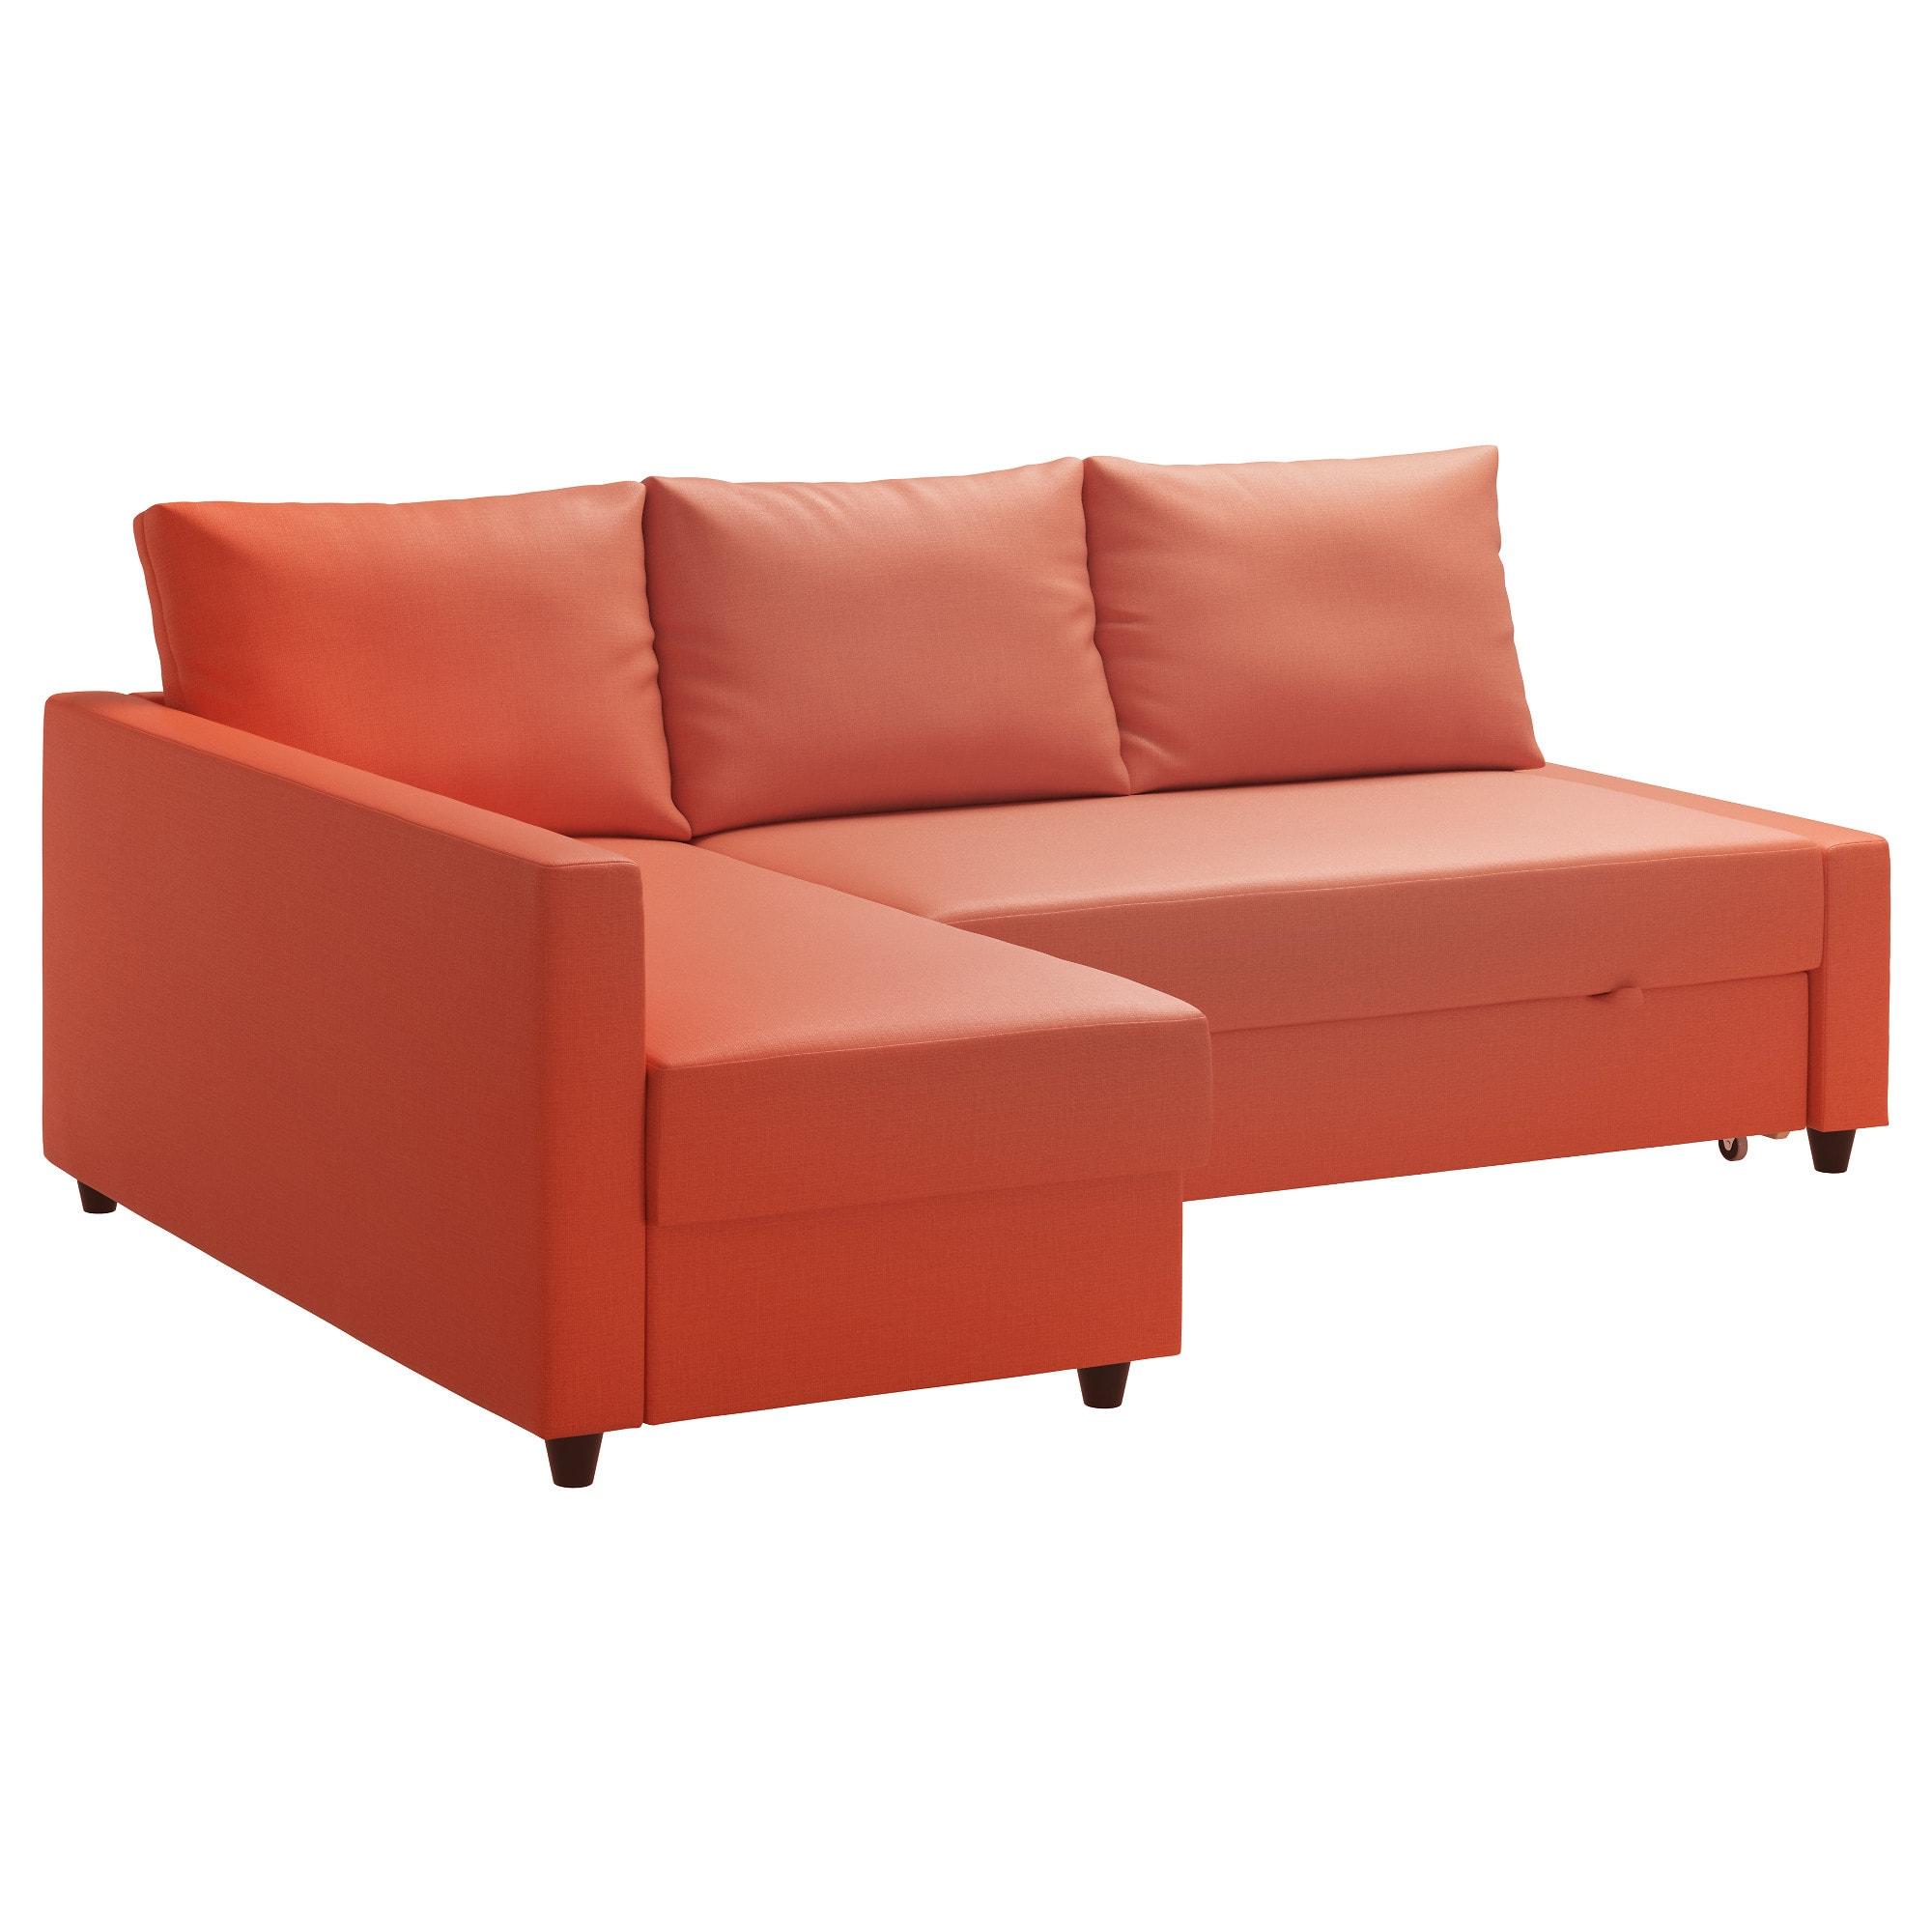 Sofas Baratos Coruña Jxdu Friheten sofà Cama Esquina Con Almacenaje Skiftebo Naranja Oscuro Ikea